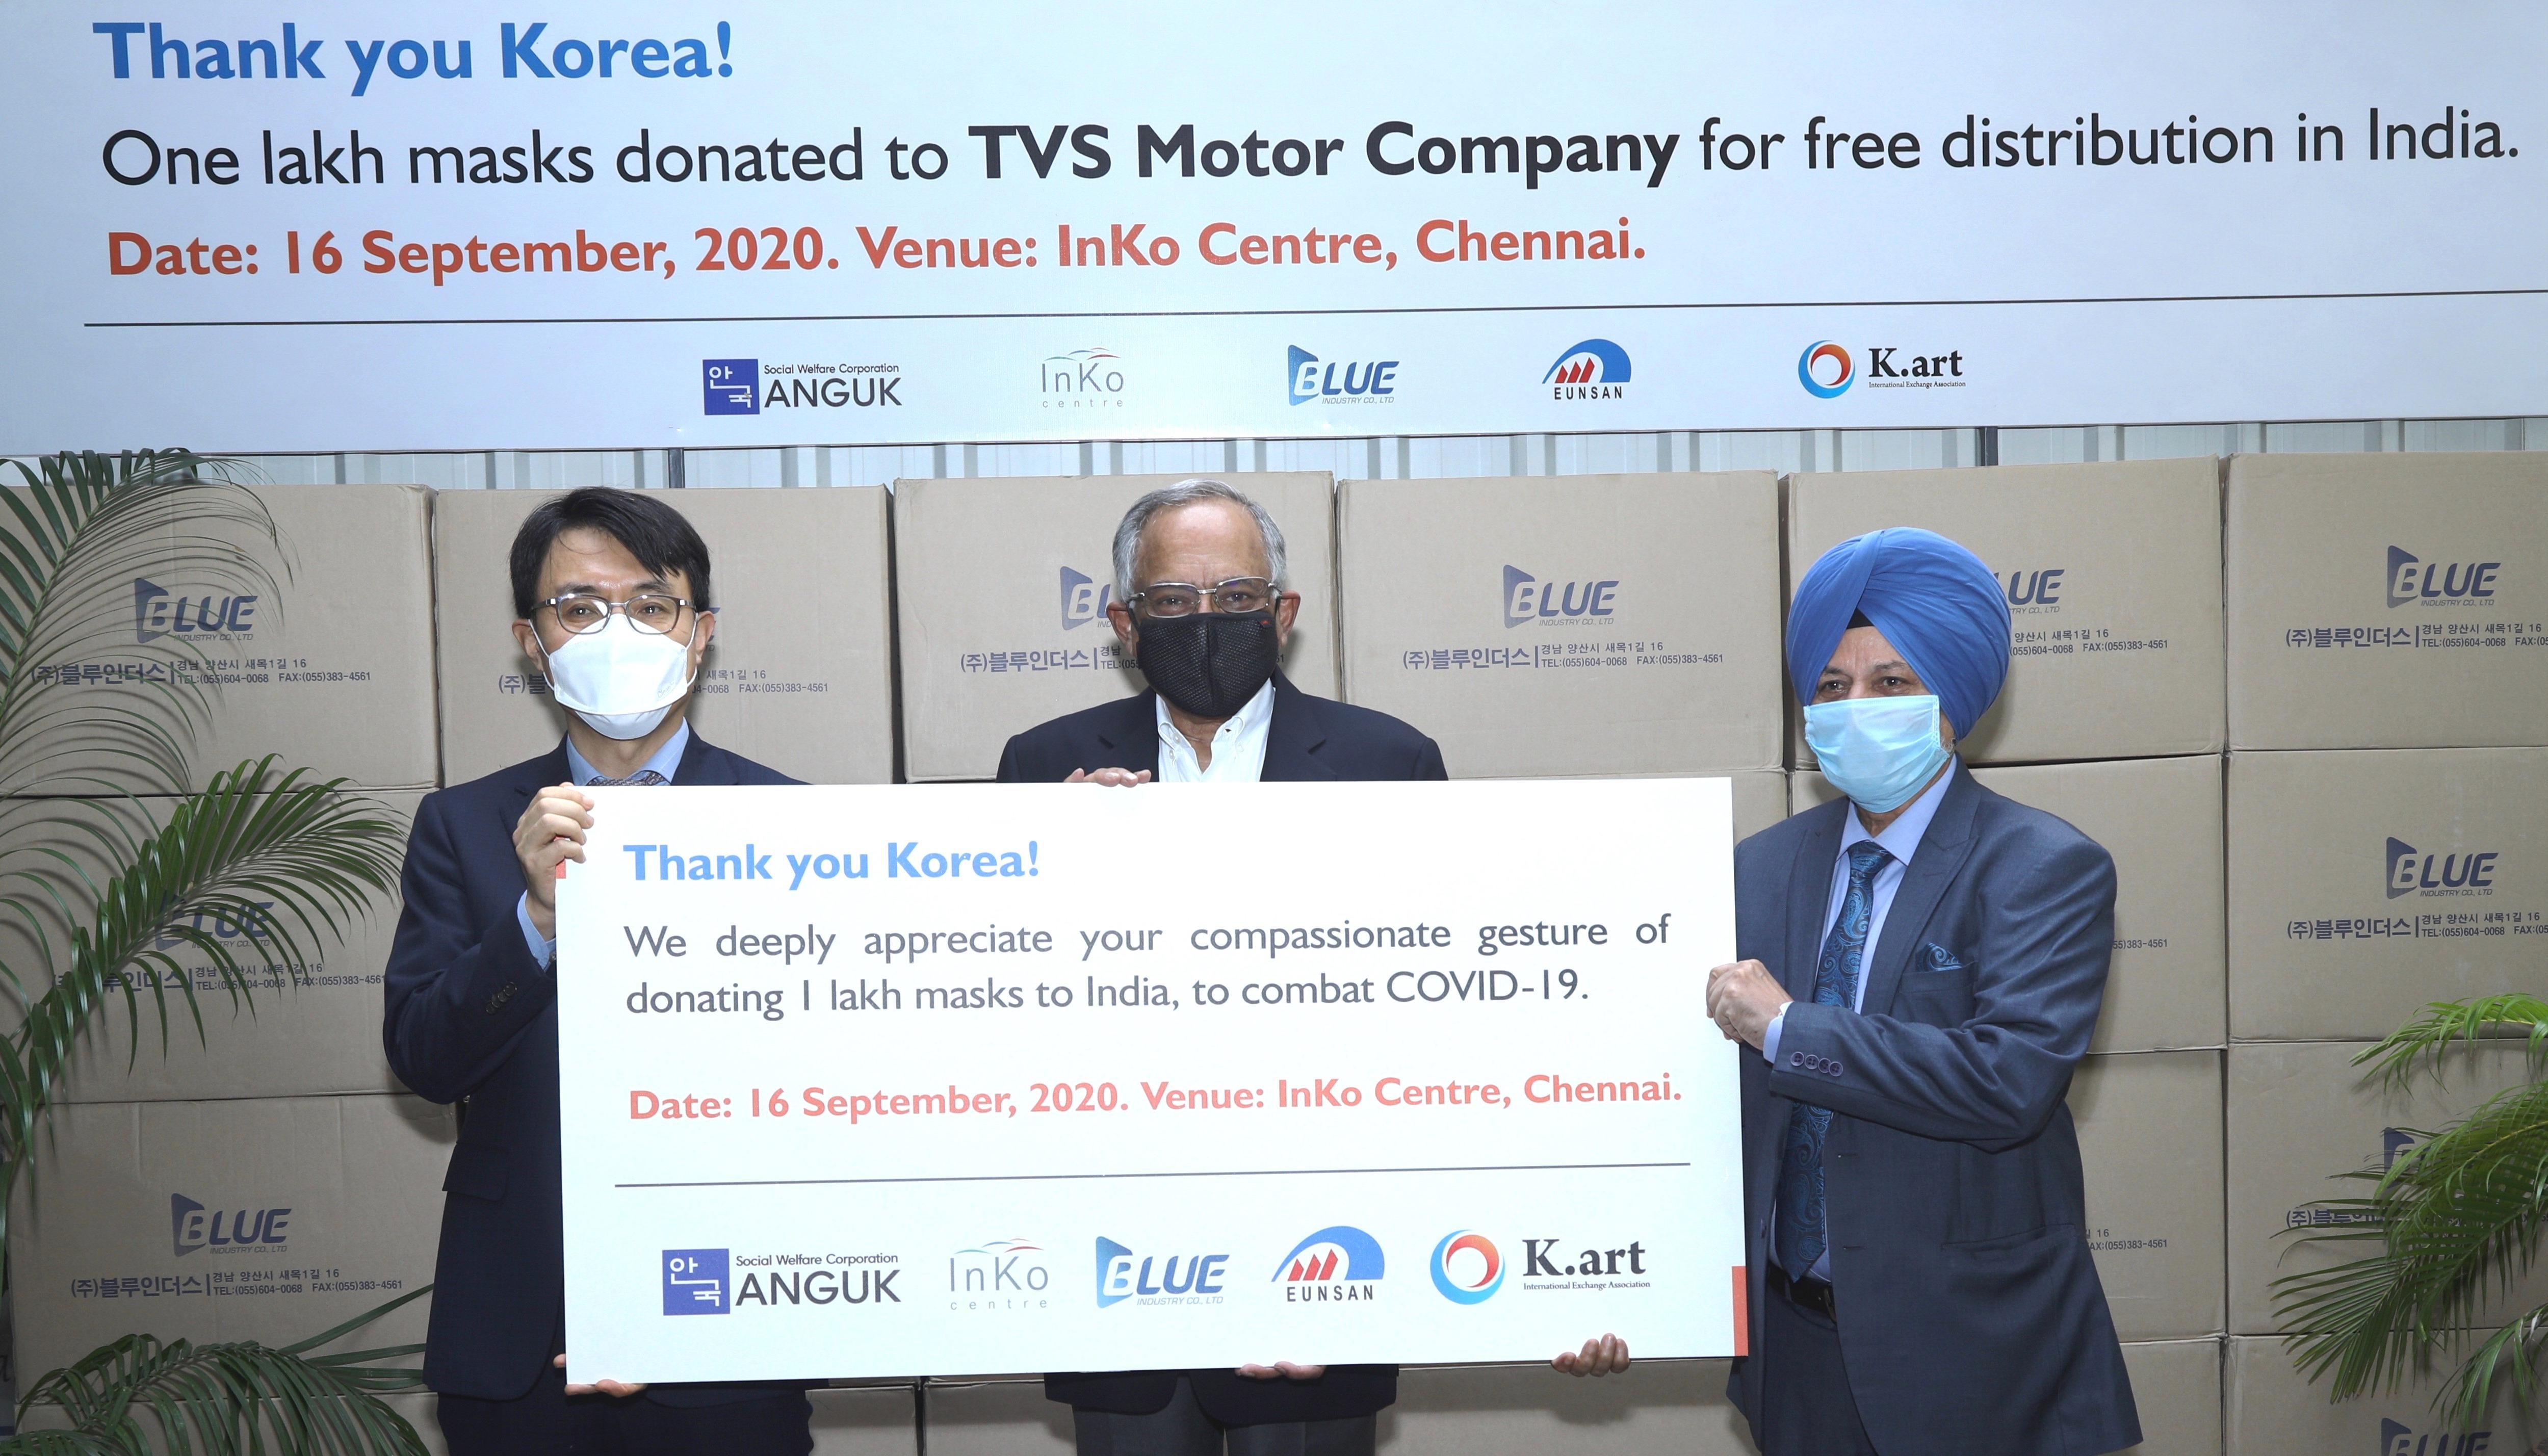 South Korea Donates One Lakh Masks To TVS Motor